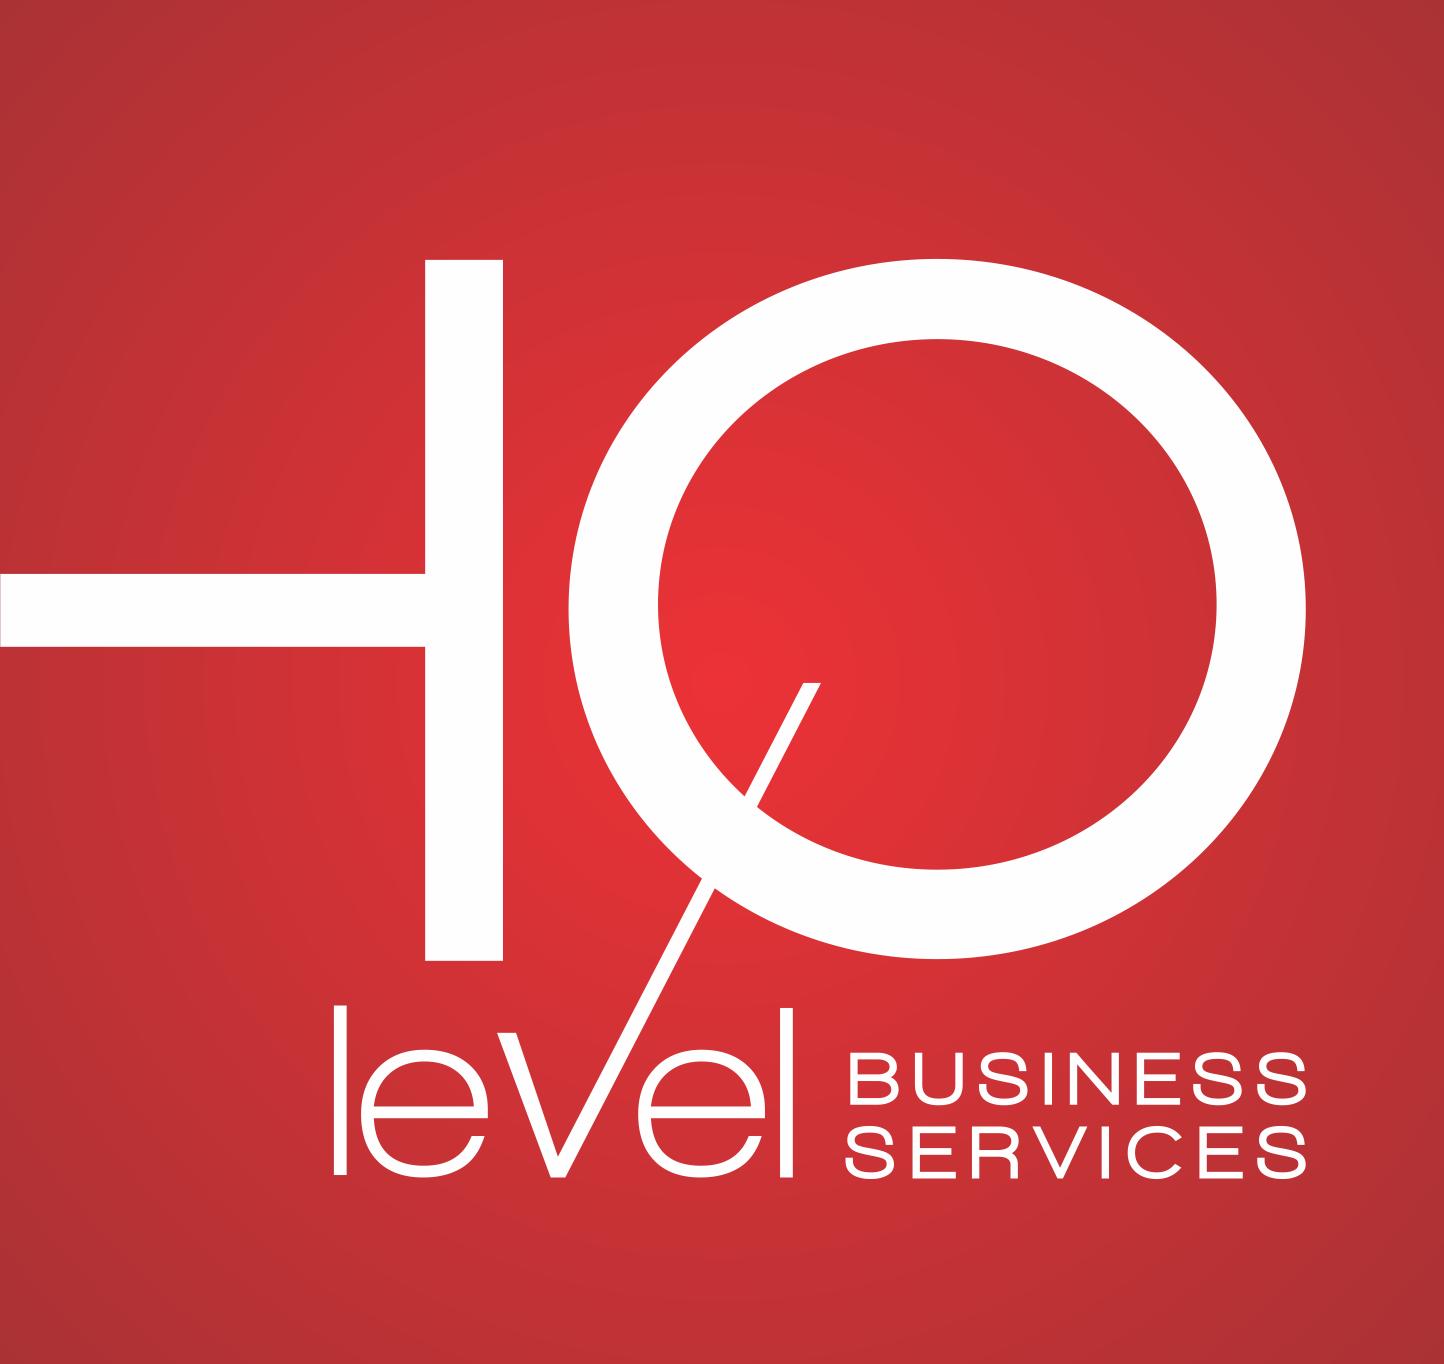 HQ LEVEL BUSINESS SERVICES